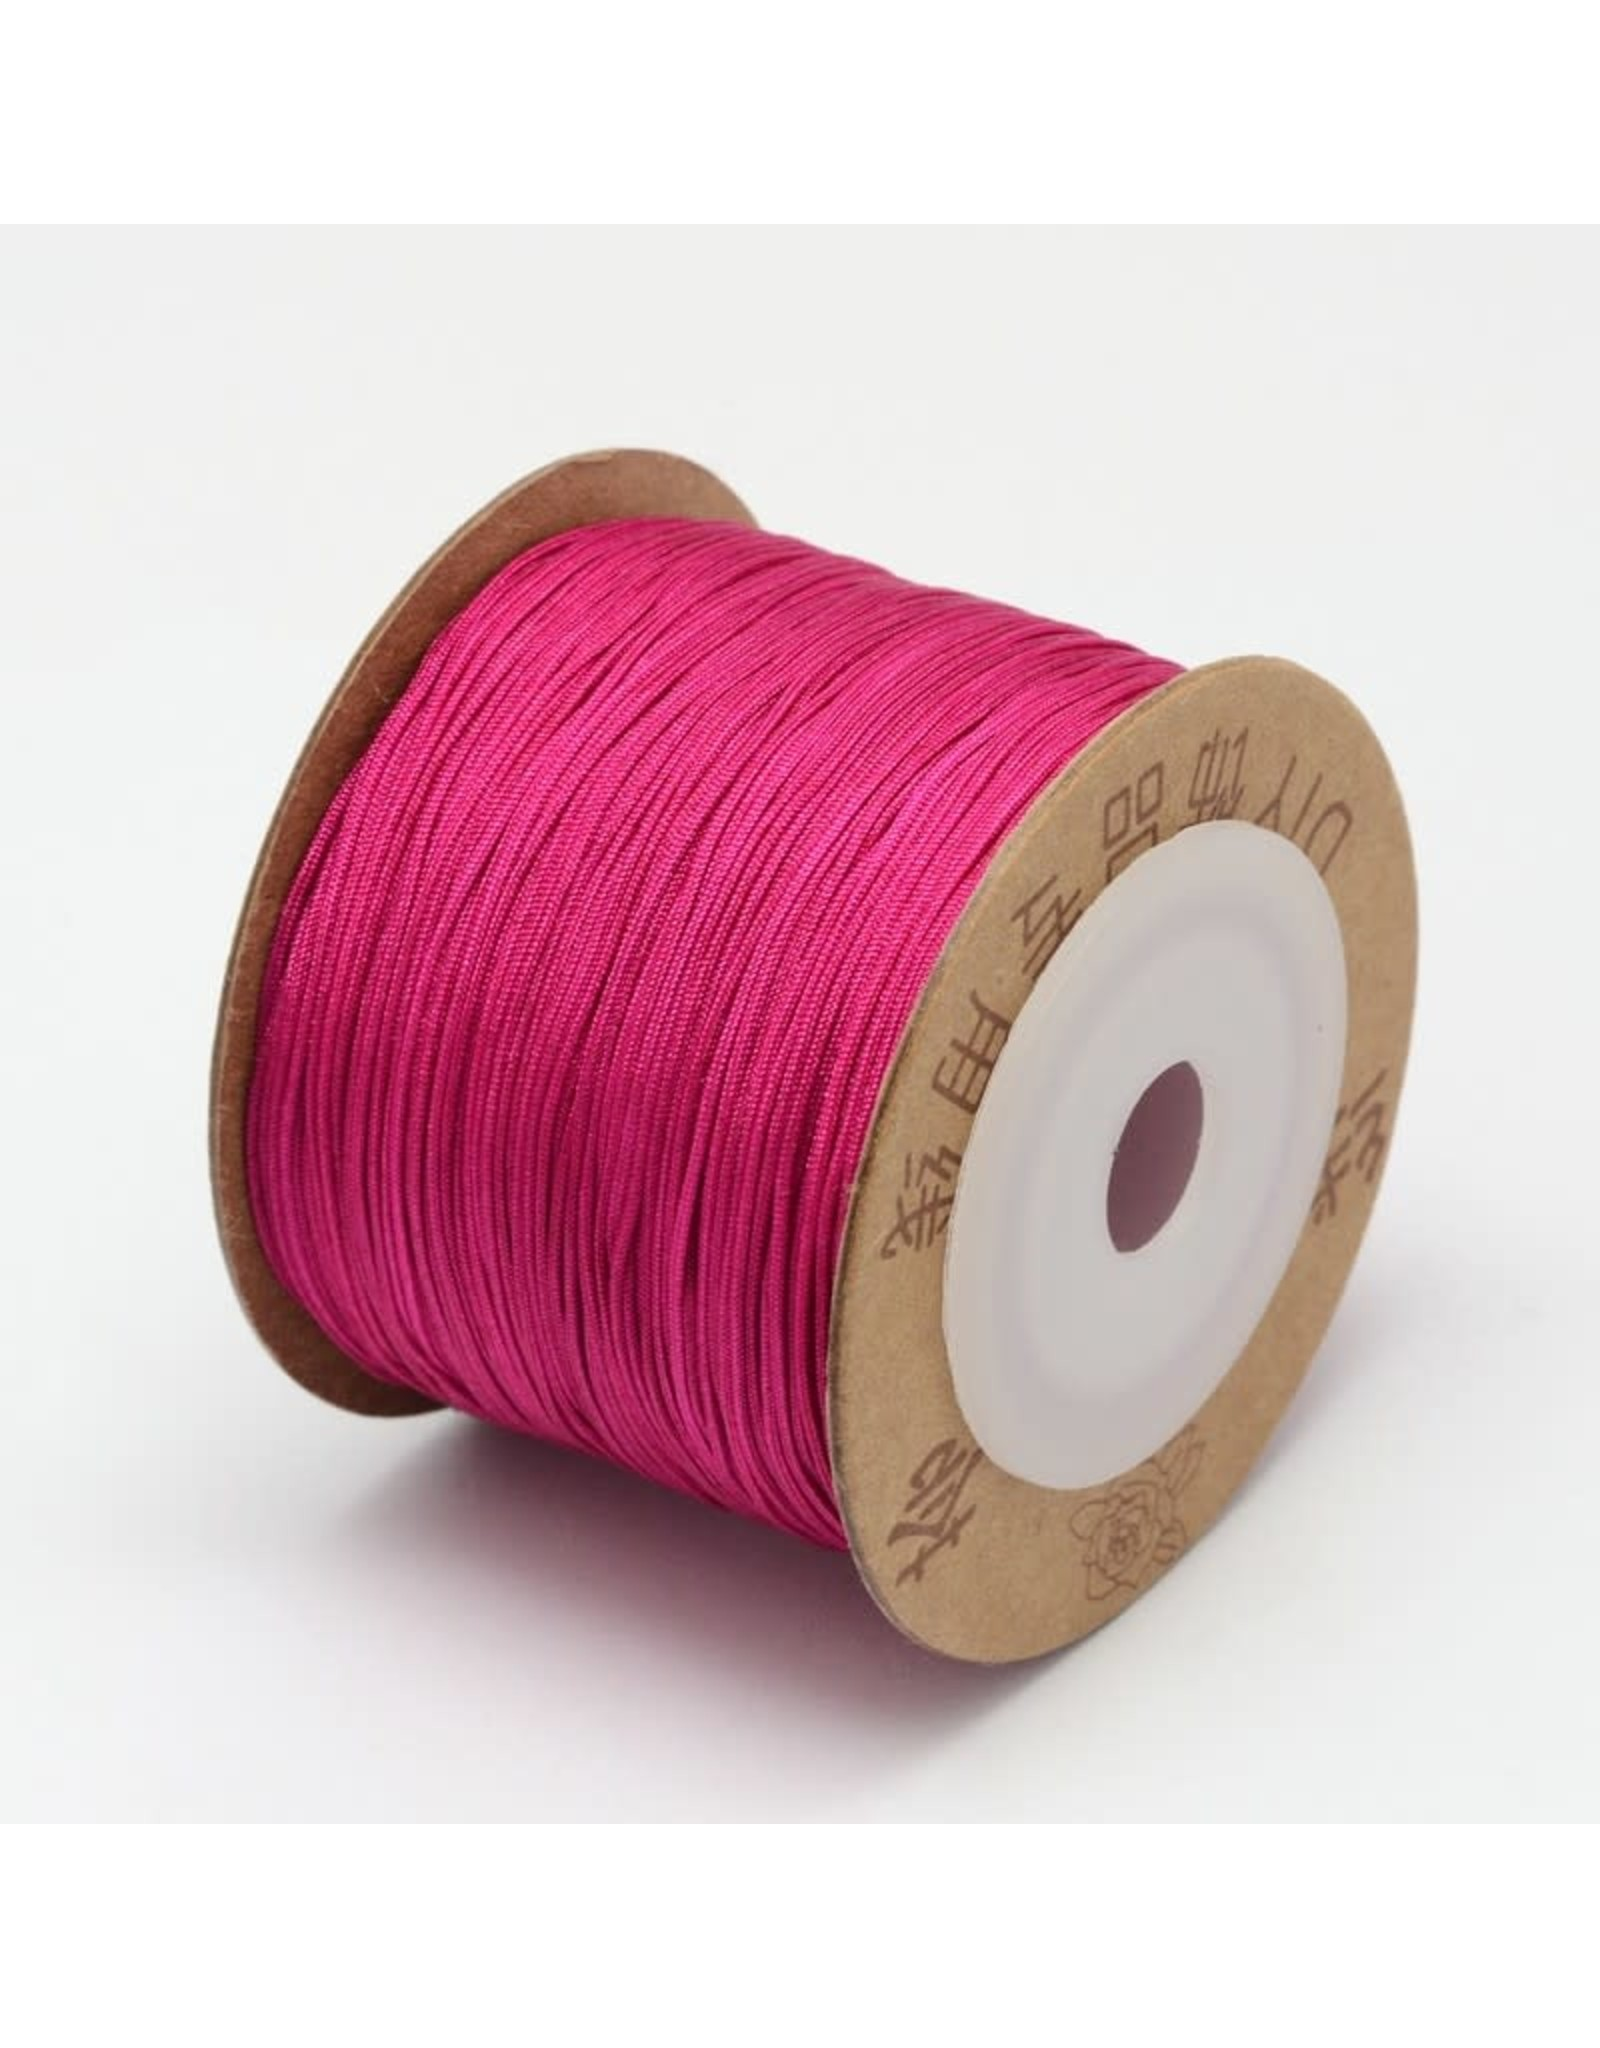 Chinese Knotting Cord .8mm Dark Pink x100m